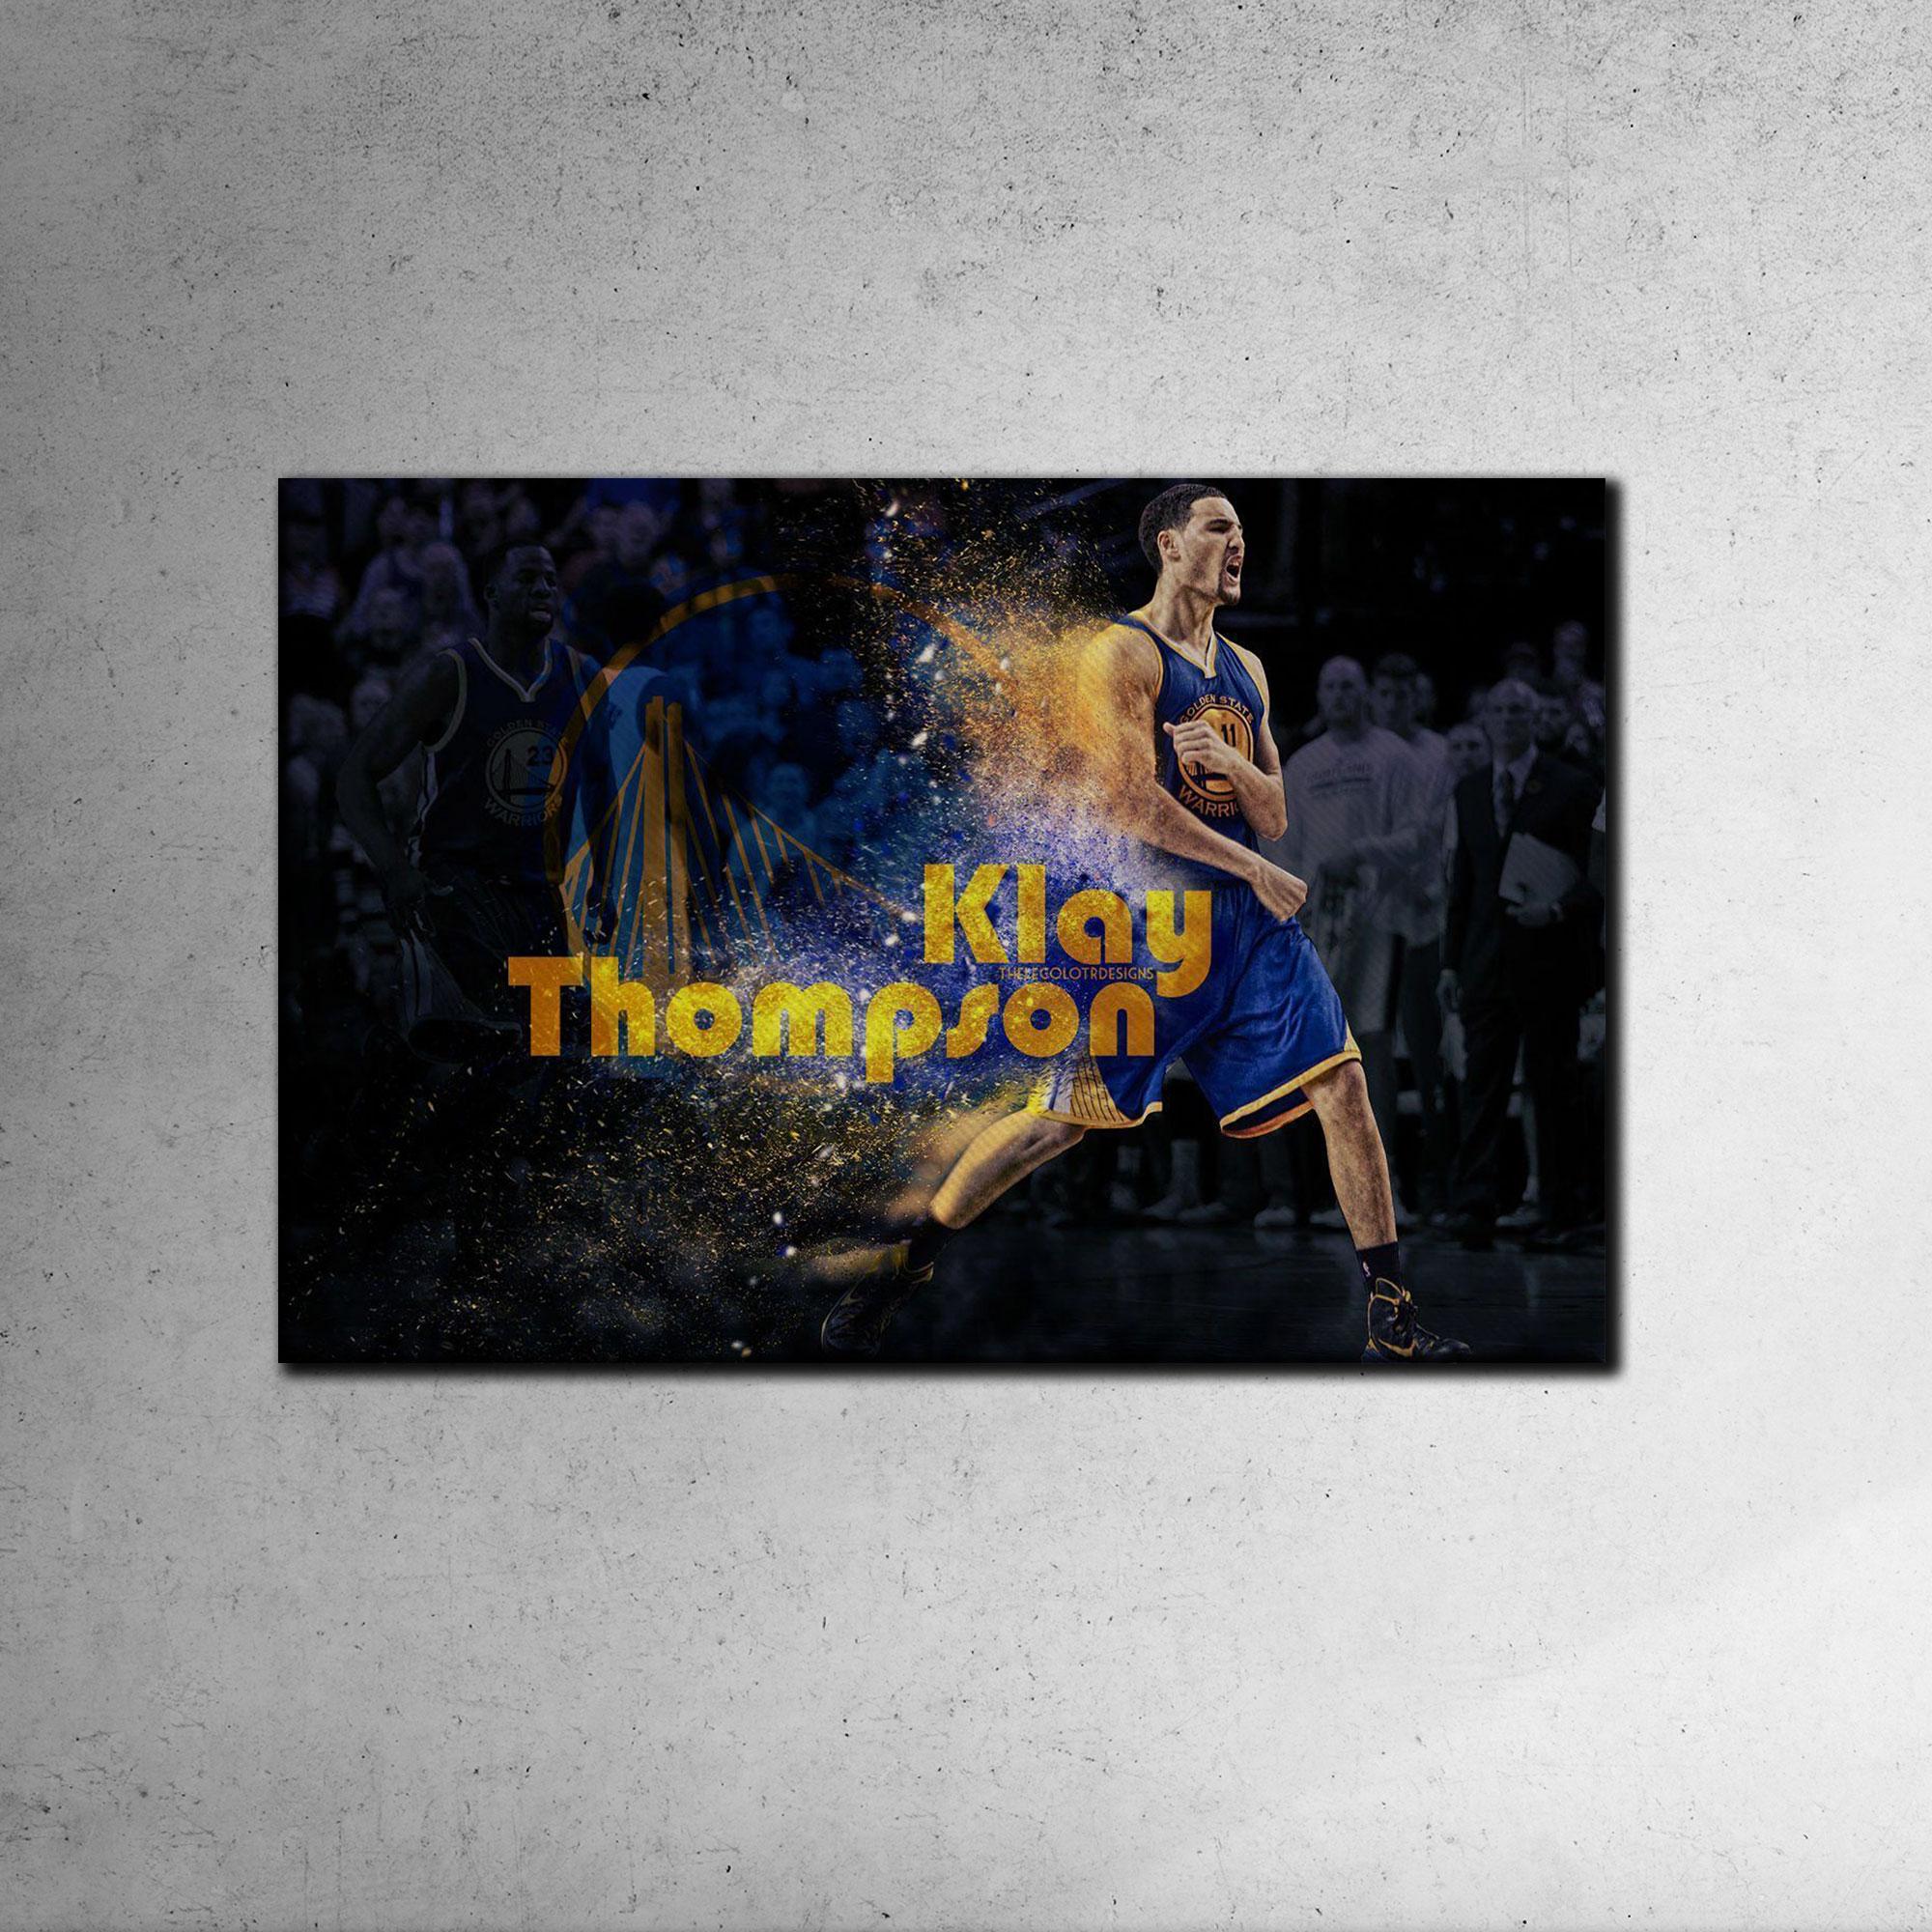 Klay Thompson Canvas Tablo (Nba-canvas-klay)